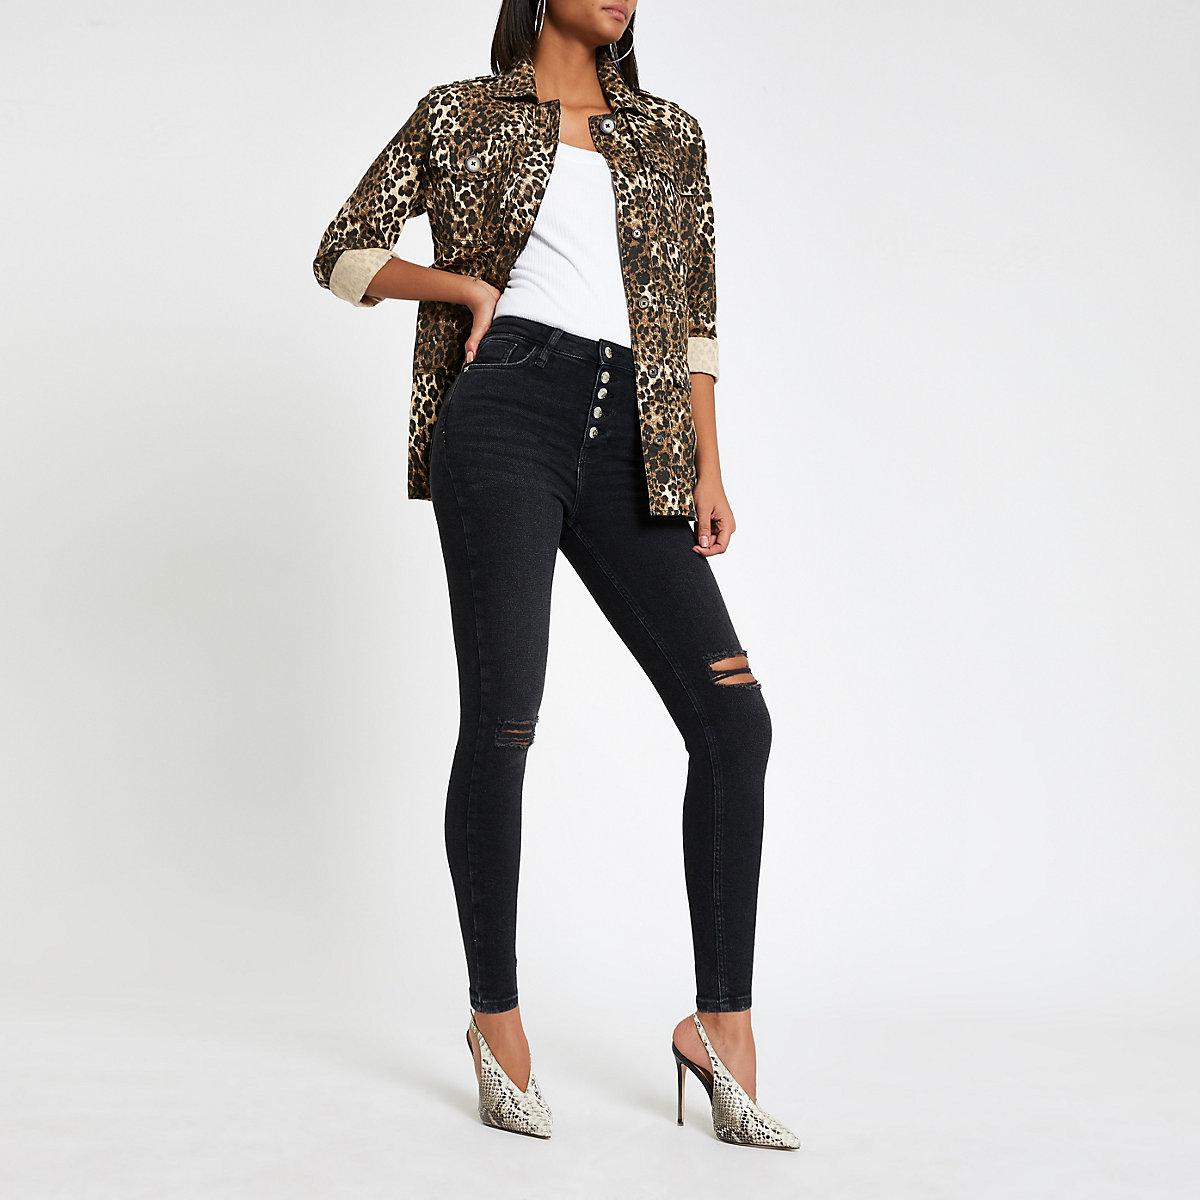 Black Hailey high rise jeans